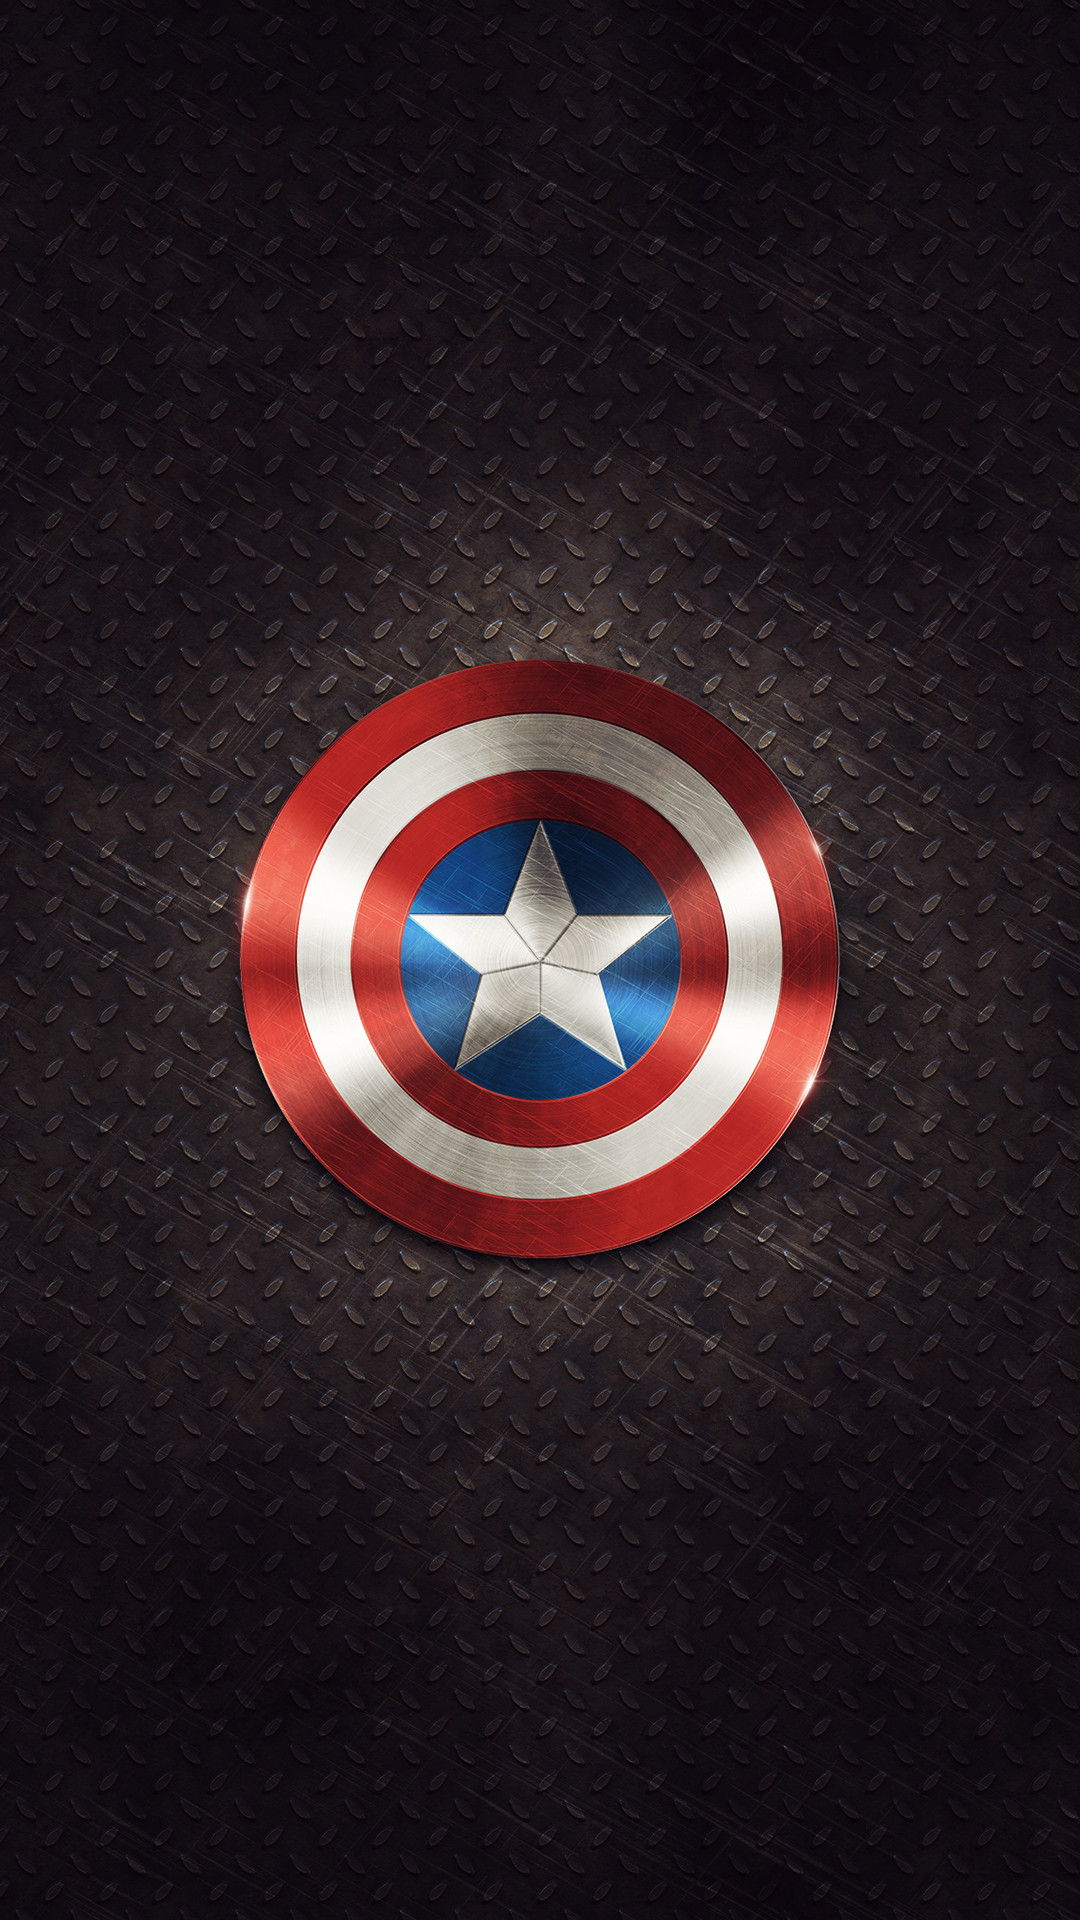 Captain America Shield iPhone 6 Plus HD Wallpaper / iPod Wallpaper